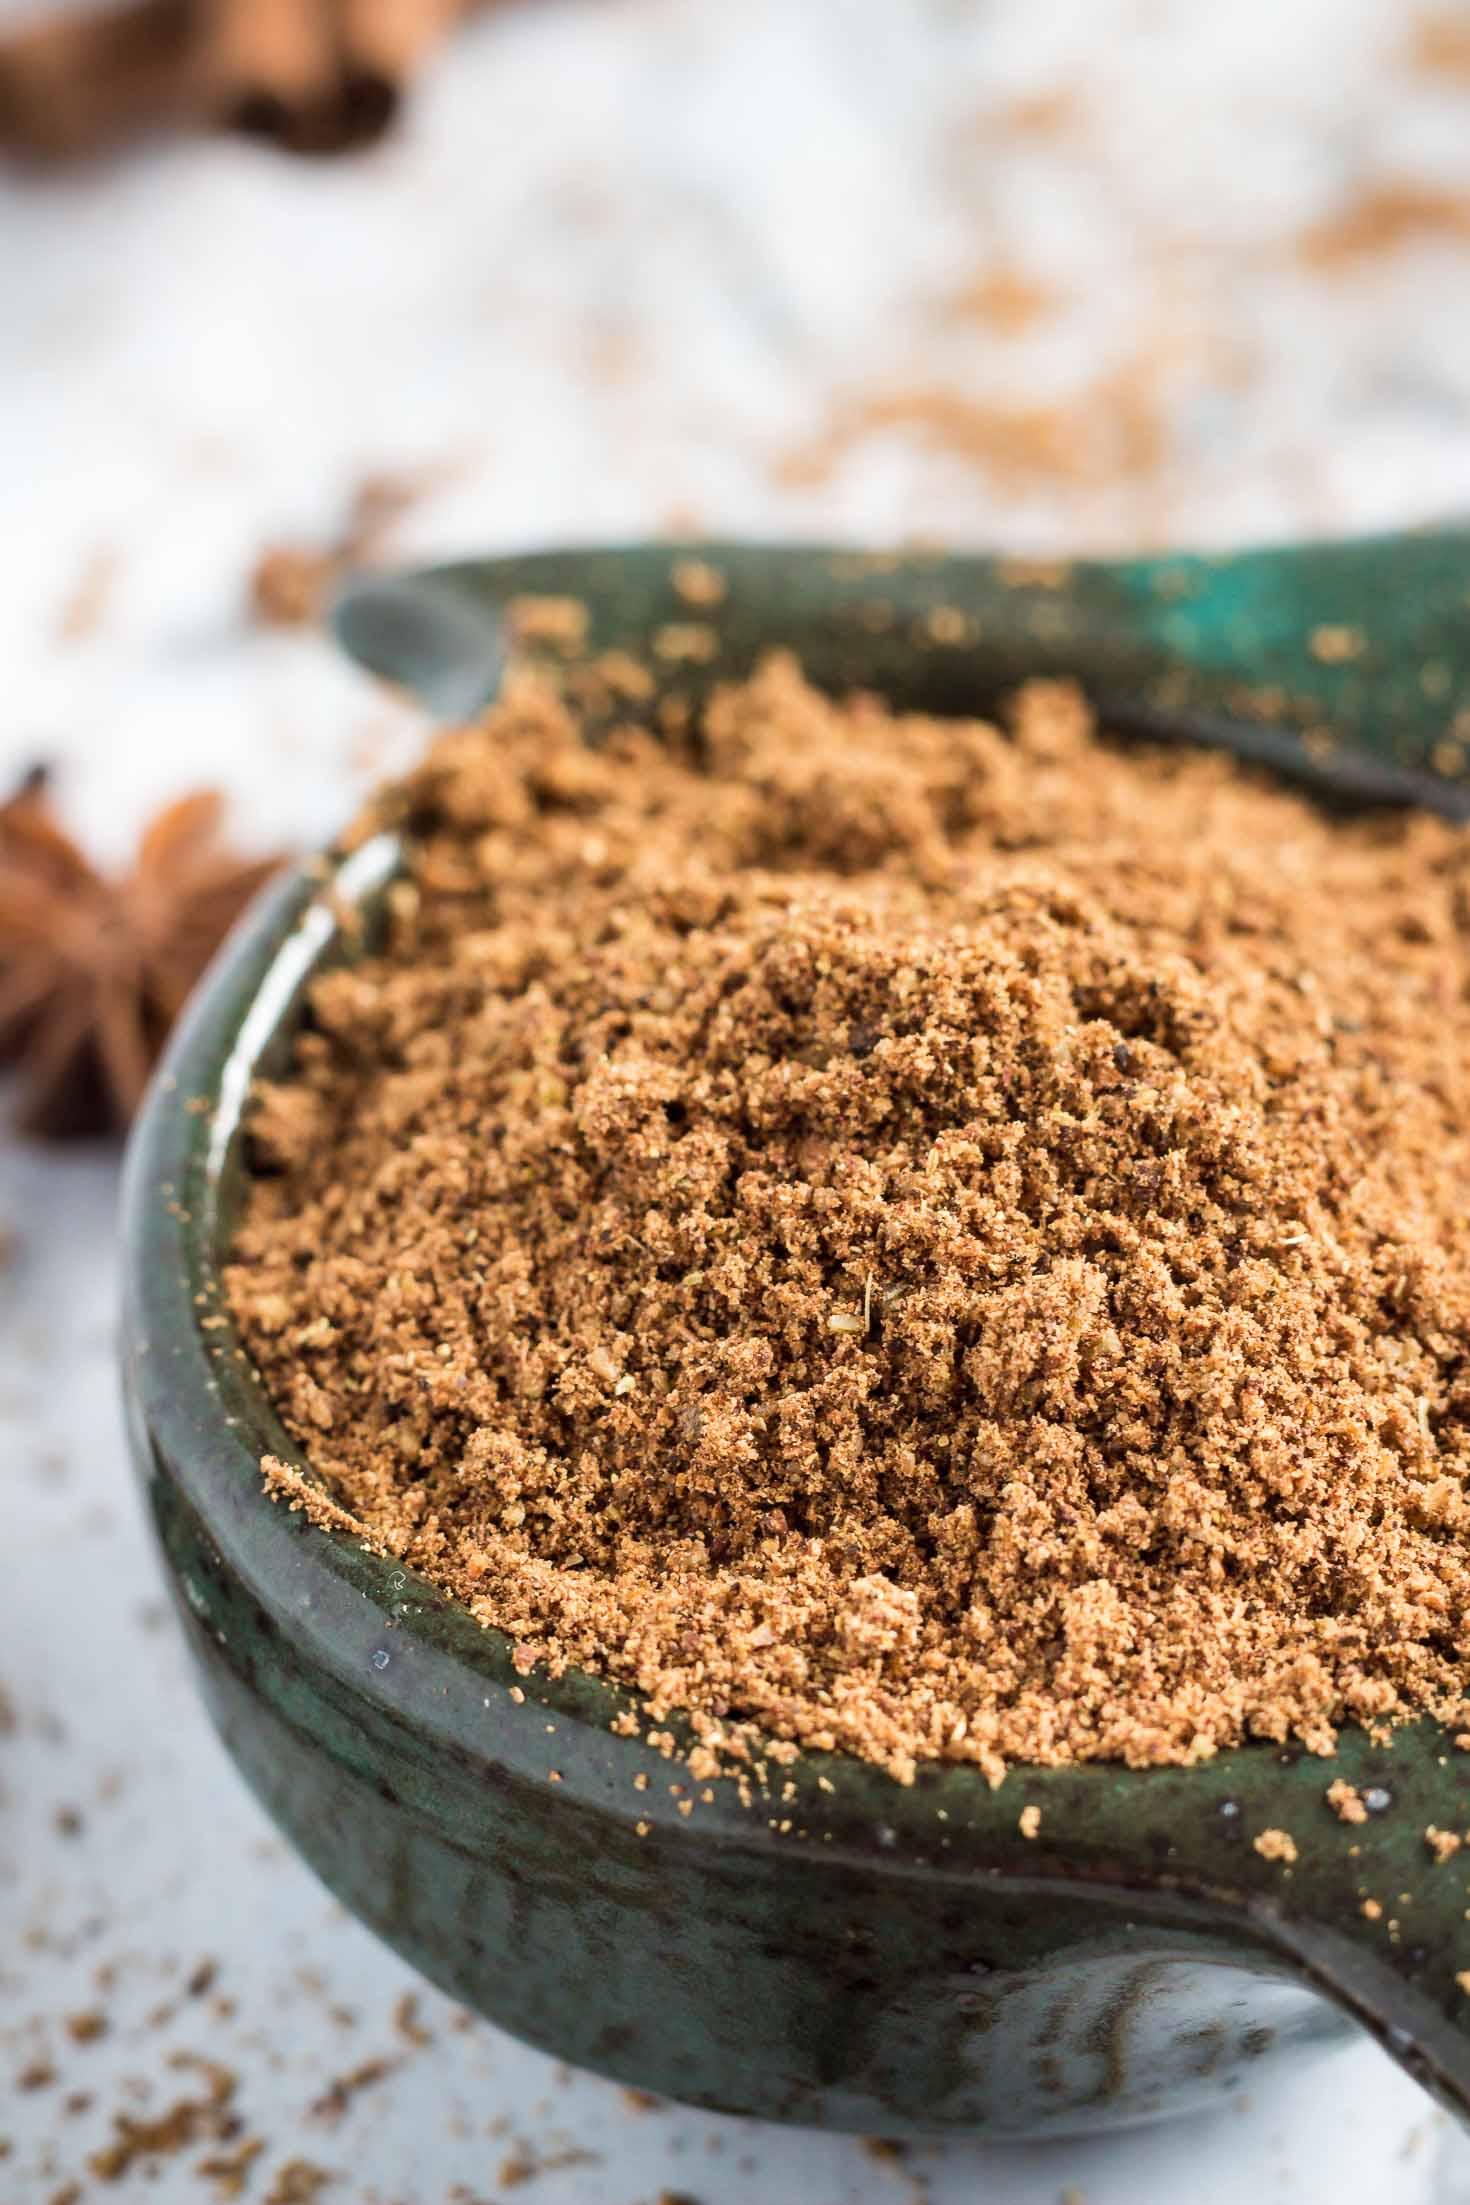 Chinese 5-spice powder-closeup view